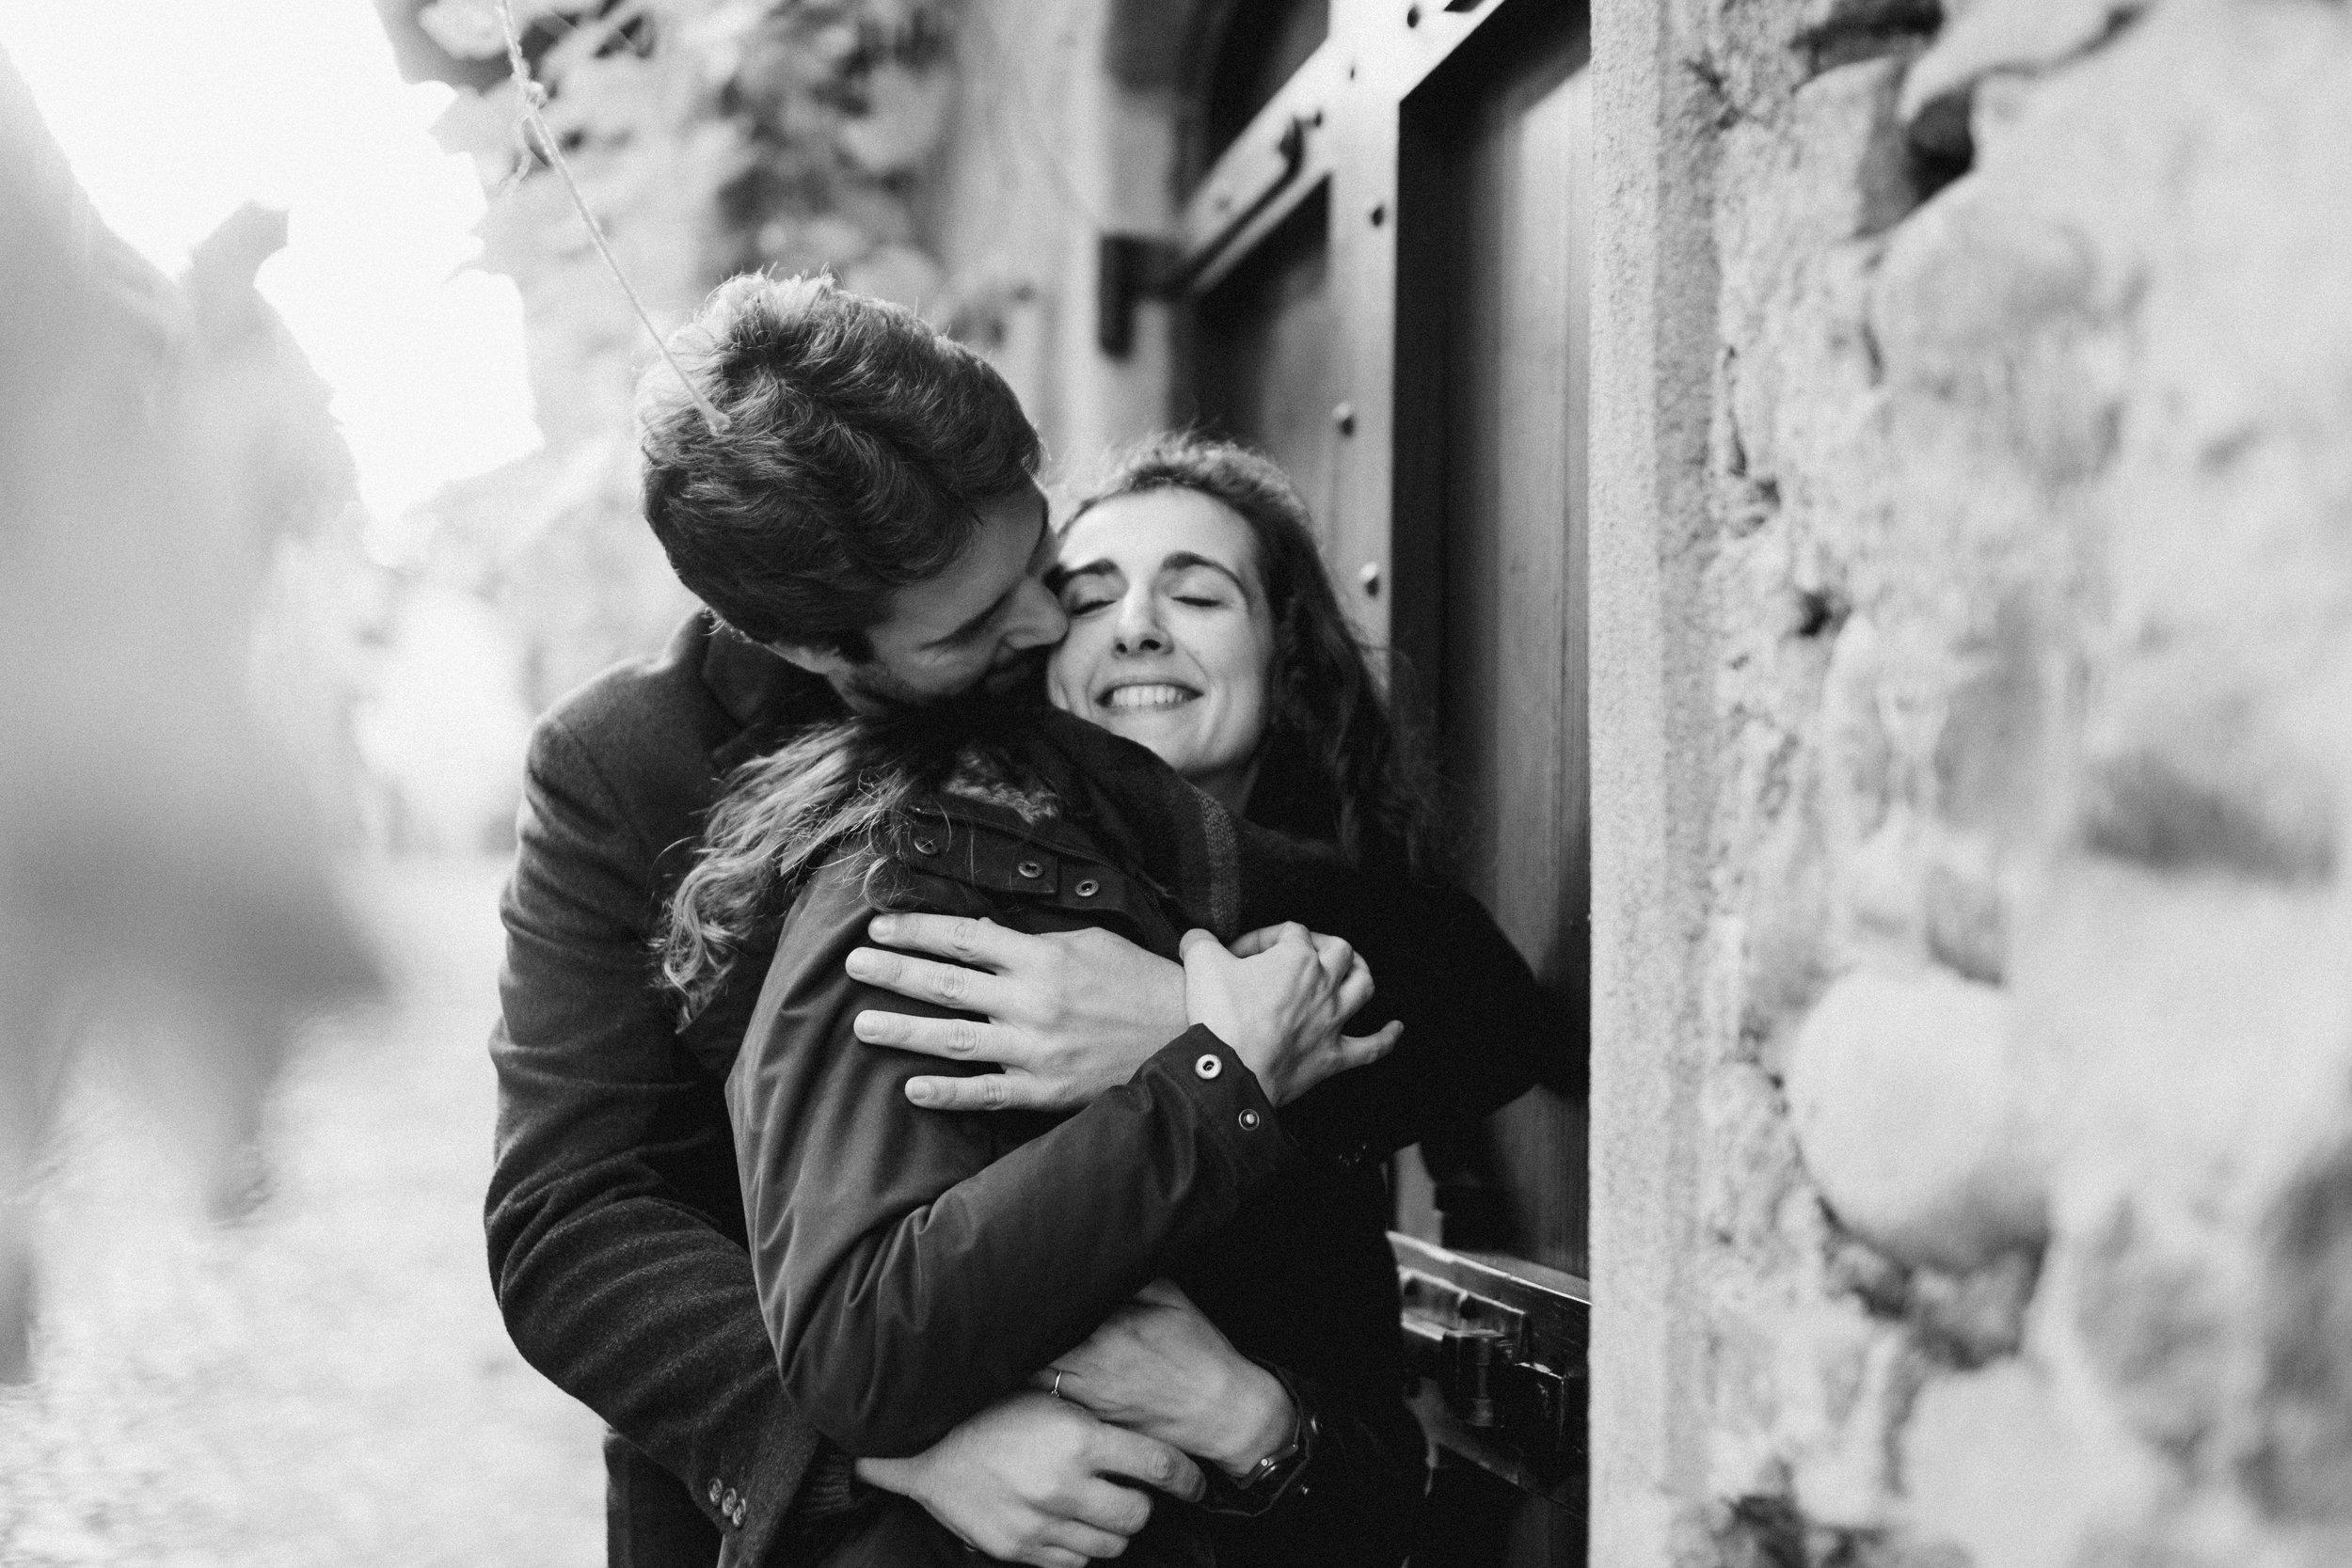 086 - Elisa + Riccardo - engagement.JPG